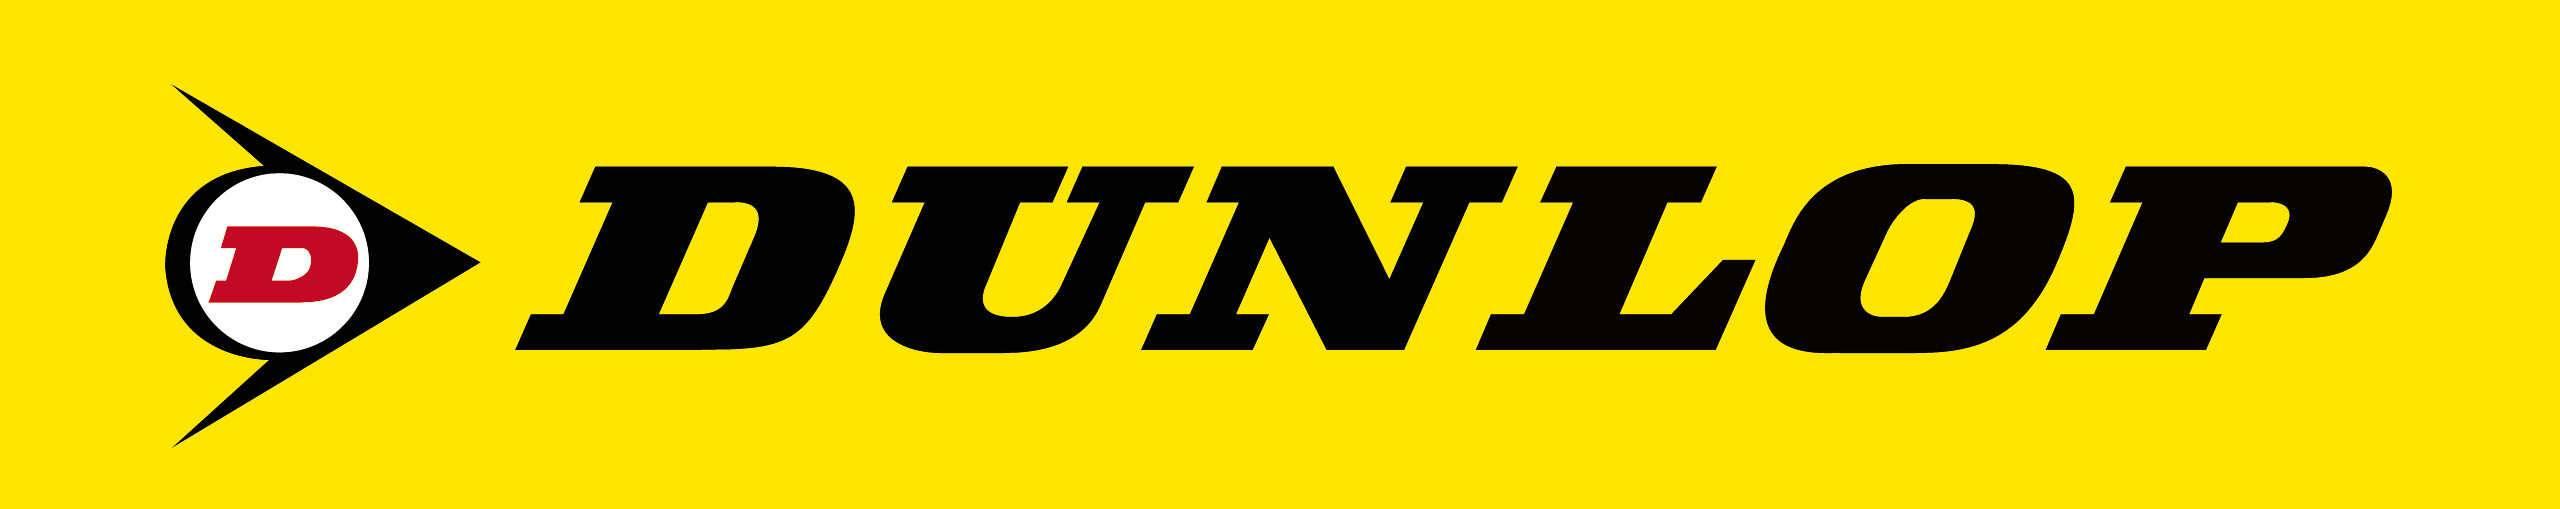 Dunlop - Logo 2 (1).jpg